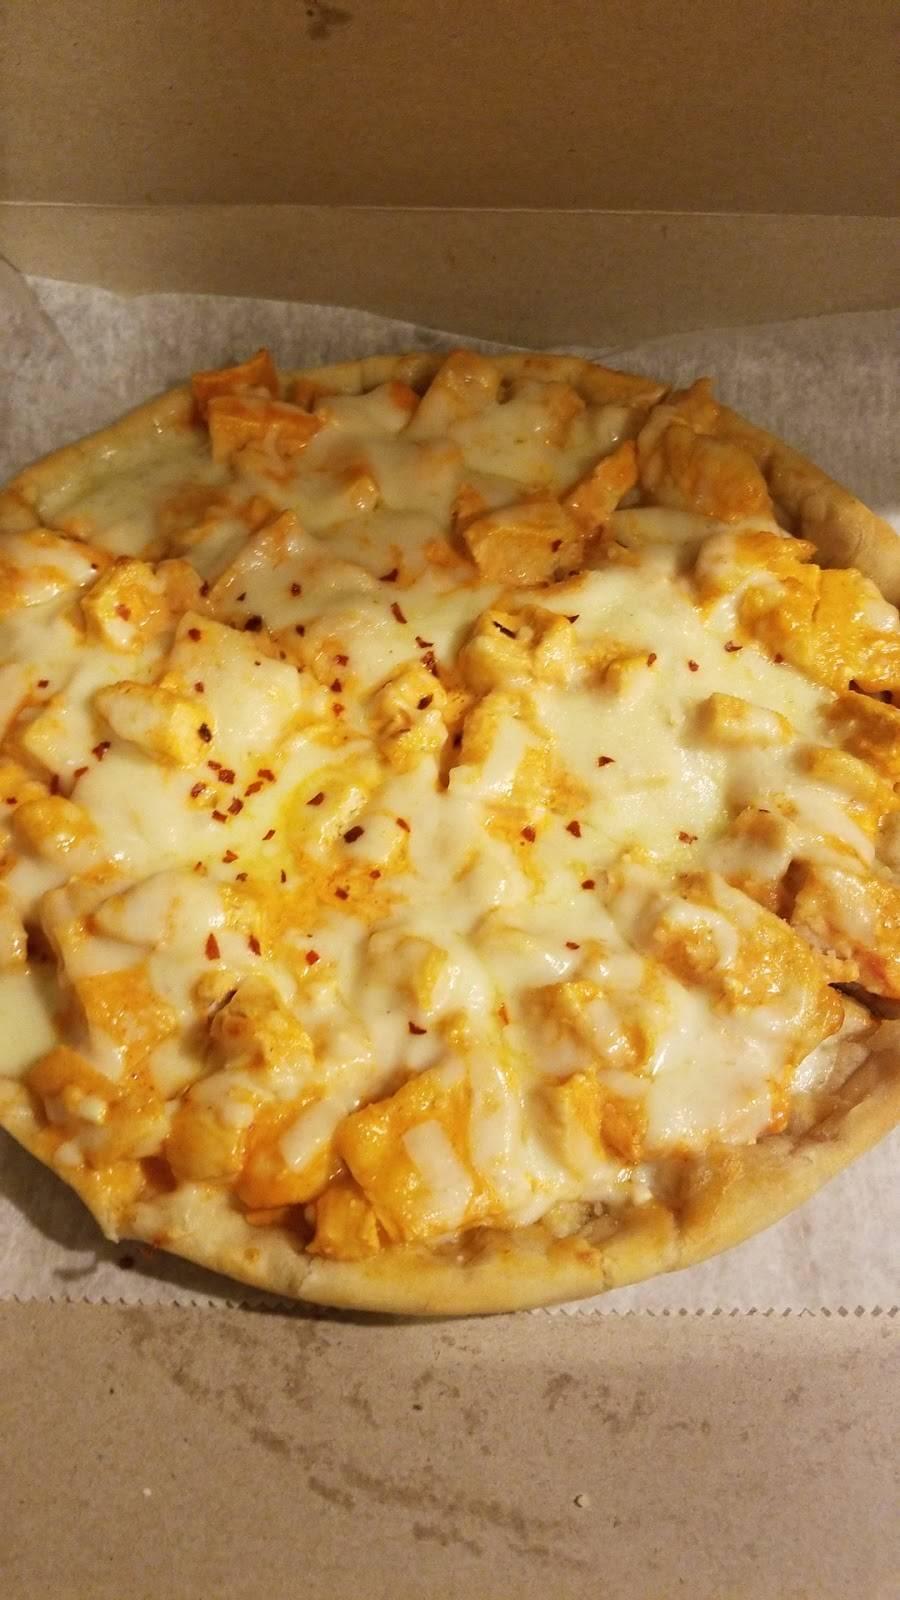 Deer Park Pizza | restaurant | 753 Long Island Ave, Deer Park, NY 11729, USA | 6315865623 OR +1 631-586-5623